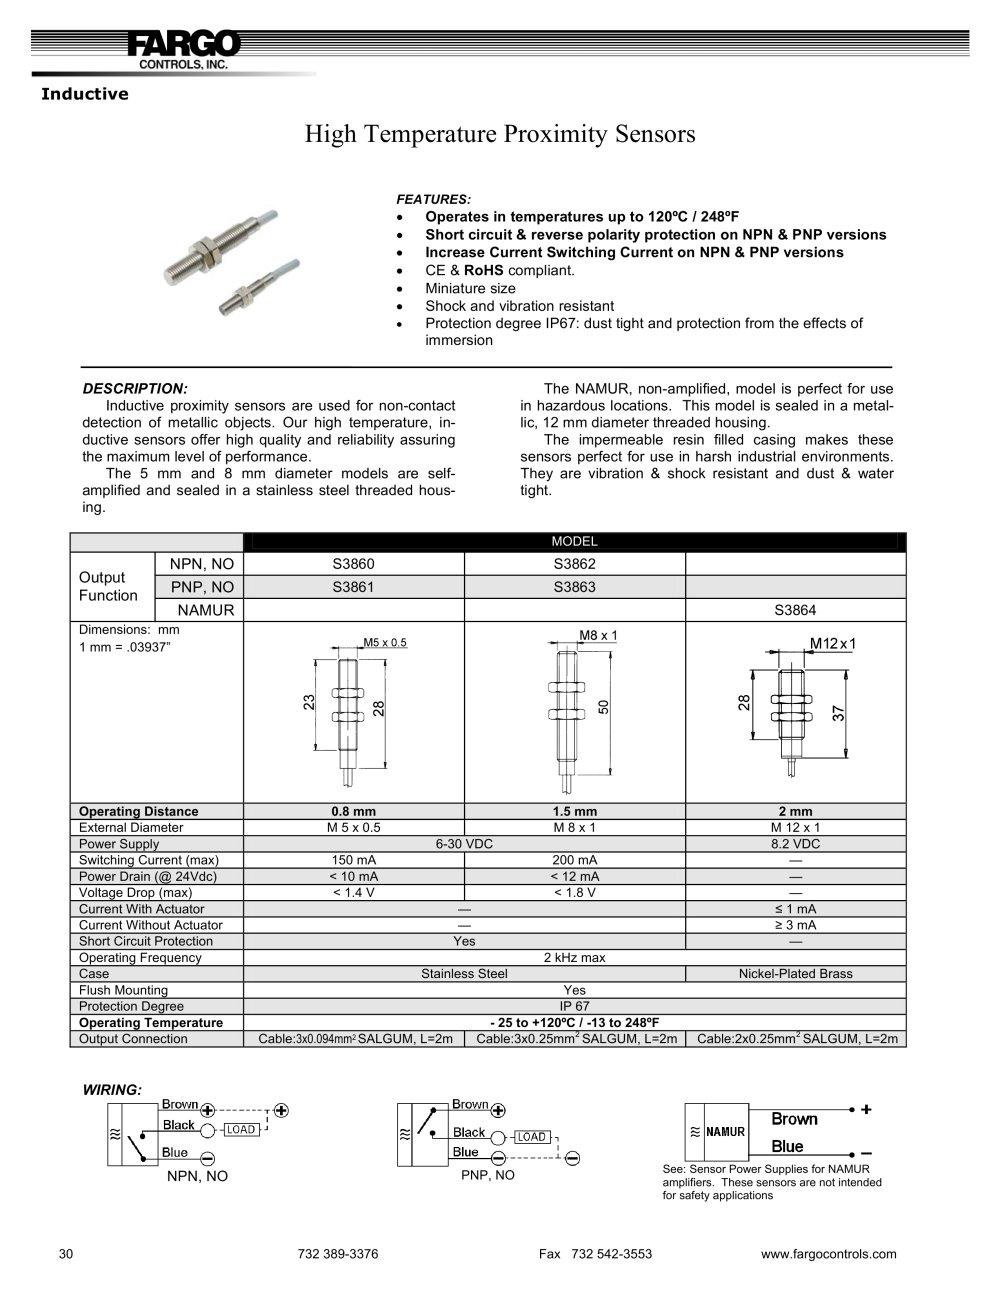 High Temperature Proximity Sensors Fargo Controls Inc Pdf Inductive Sensor Wiring Diagram Switch 1 Pages